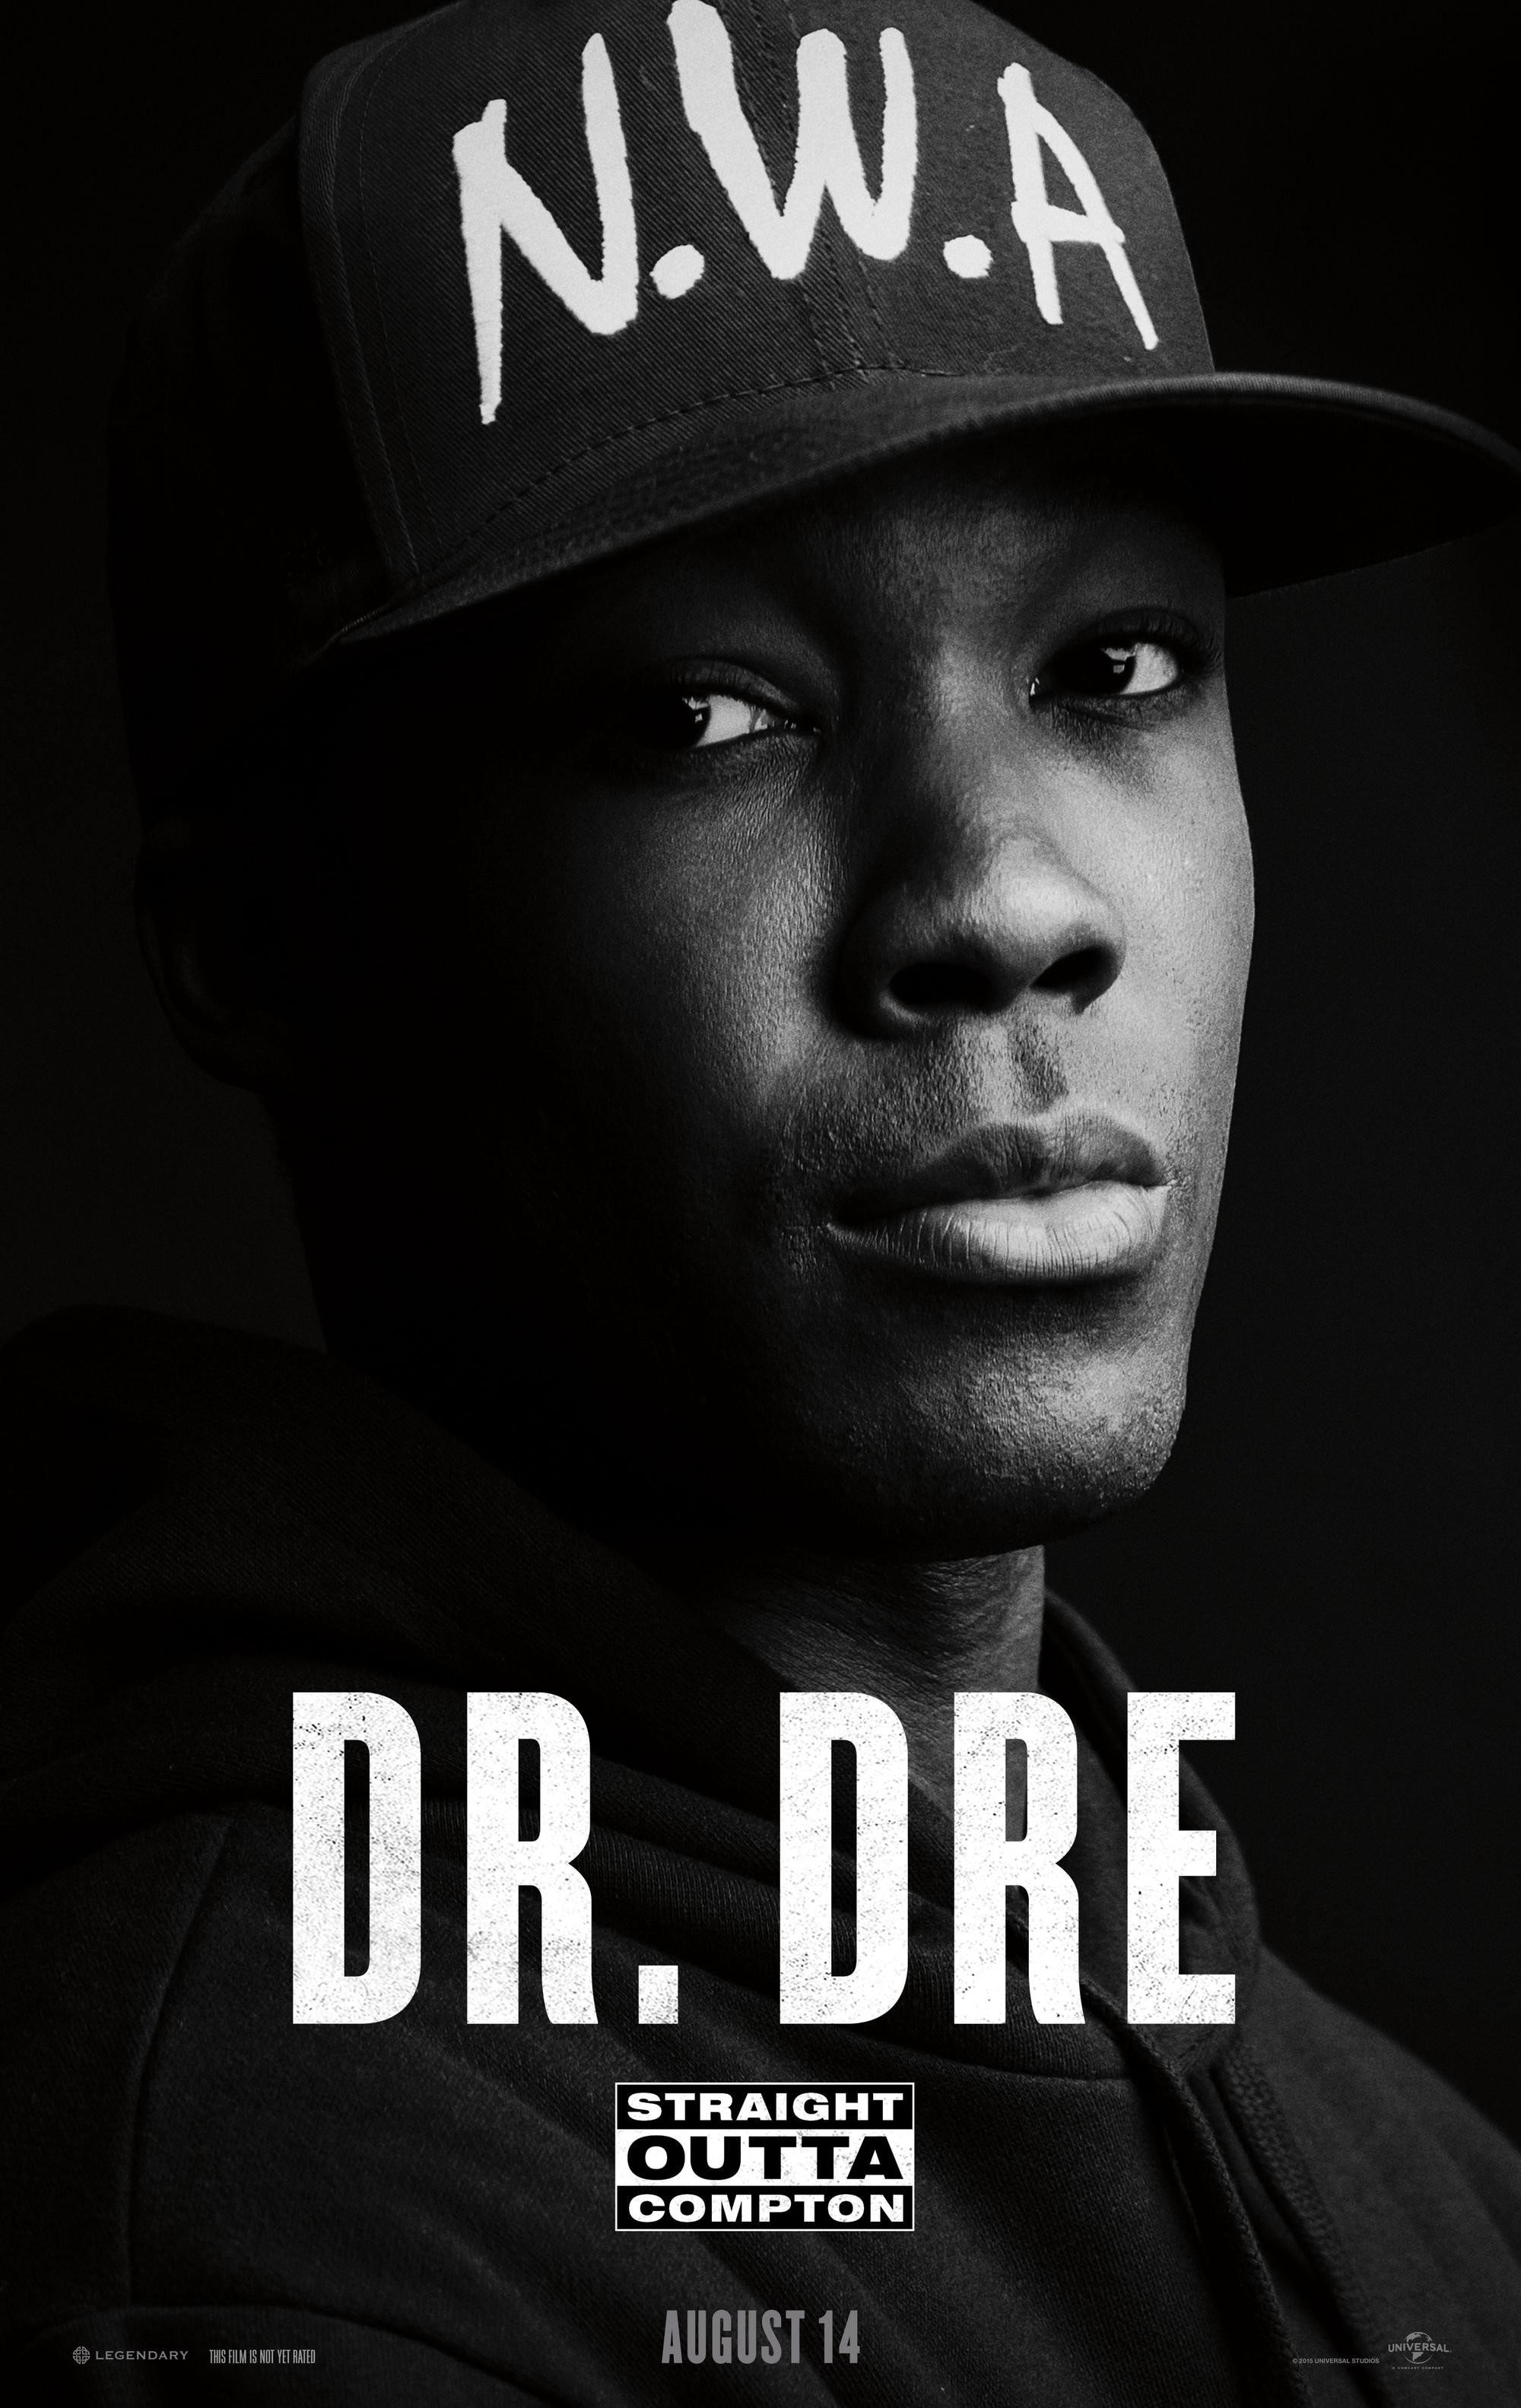 STRAIGHT OUTTA COMPTON rap rapper hip hop gangsta nwa biography drama music  1soc poster wallpaper | | 789271 | WallpaperUP